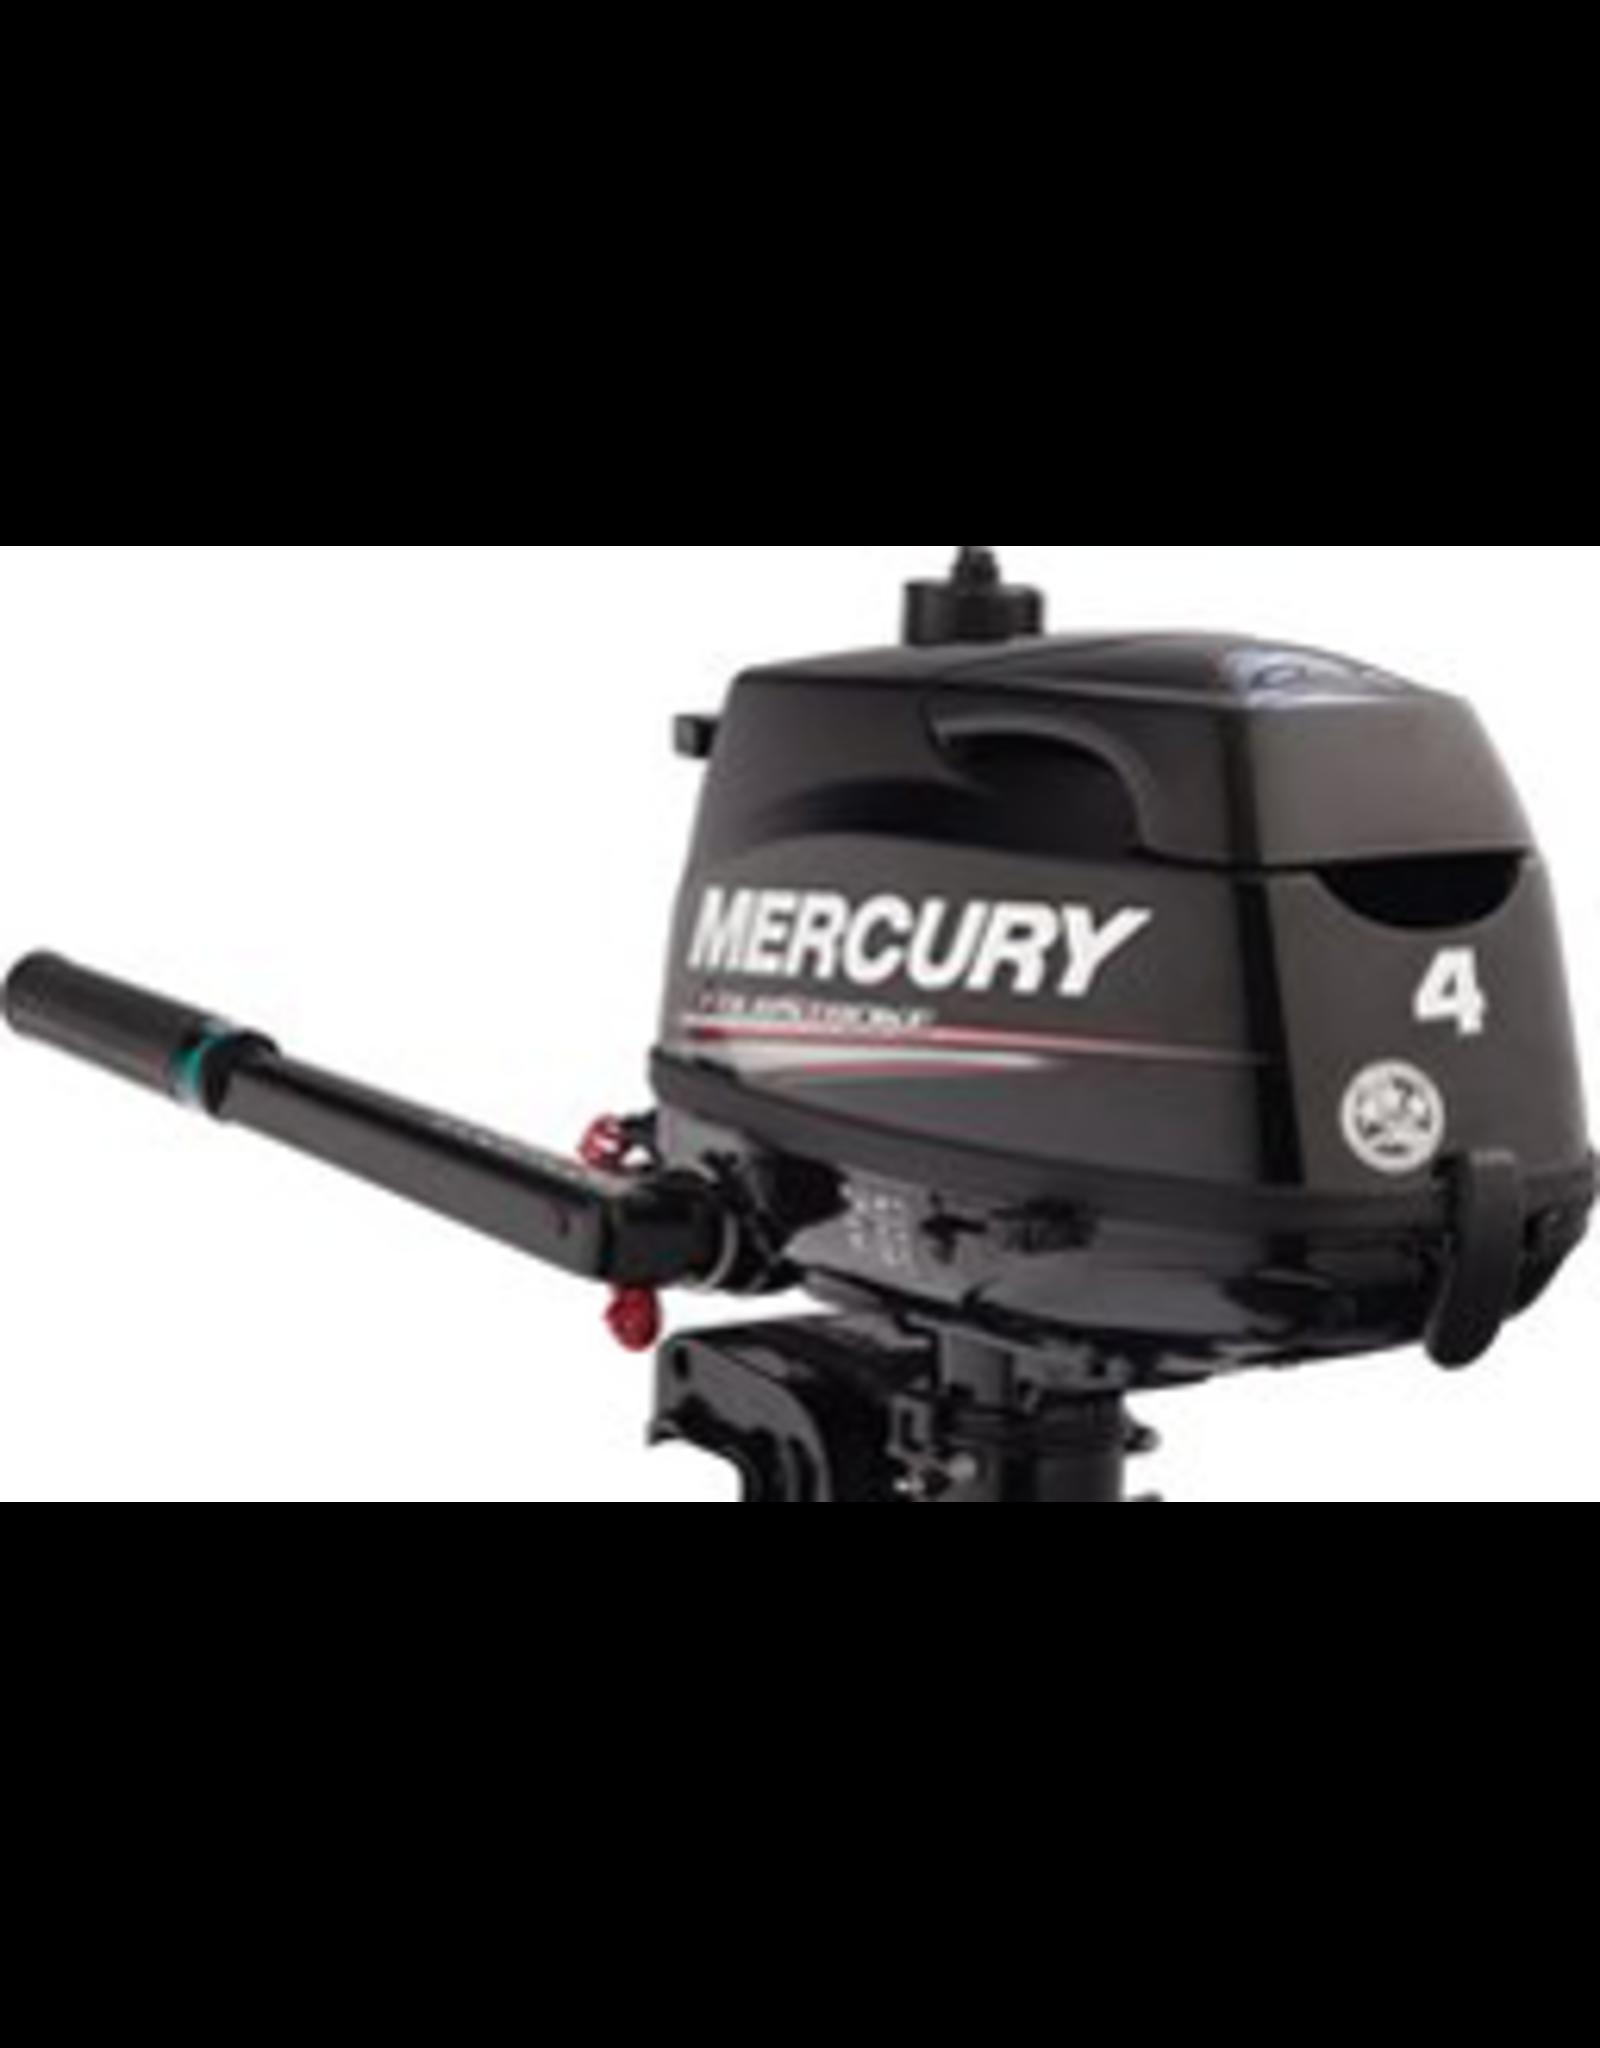 Mercury Mercury F4MH buitenboordmotor